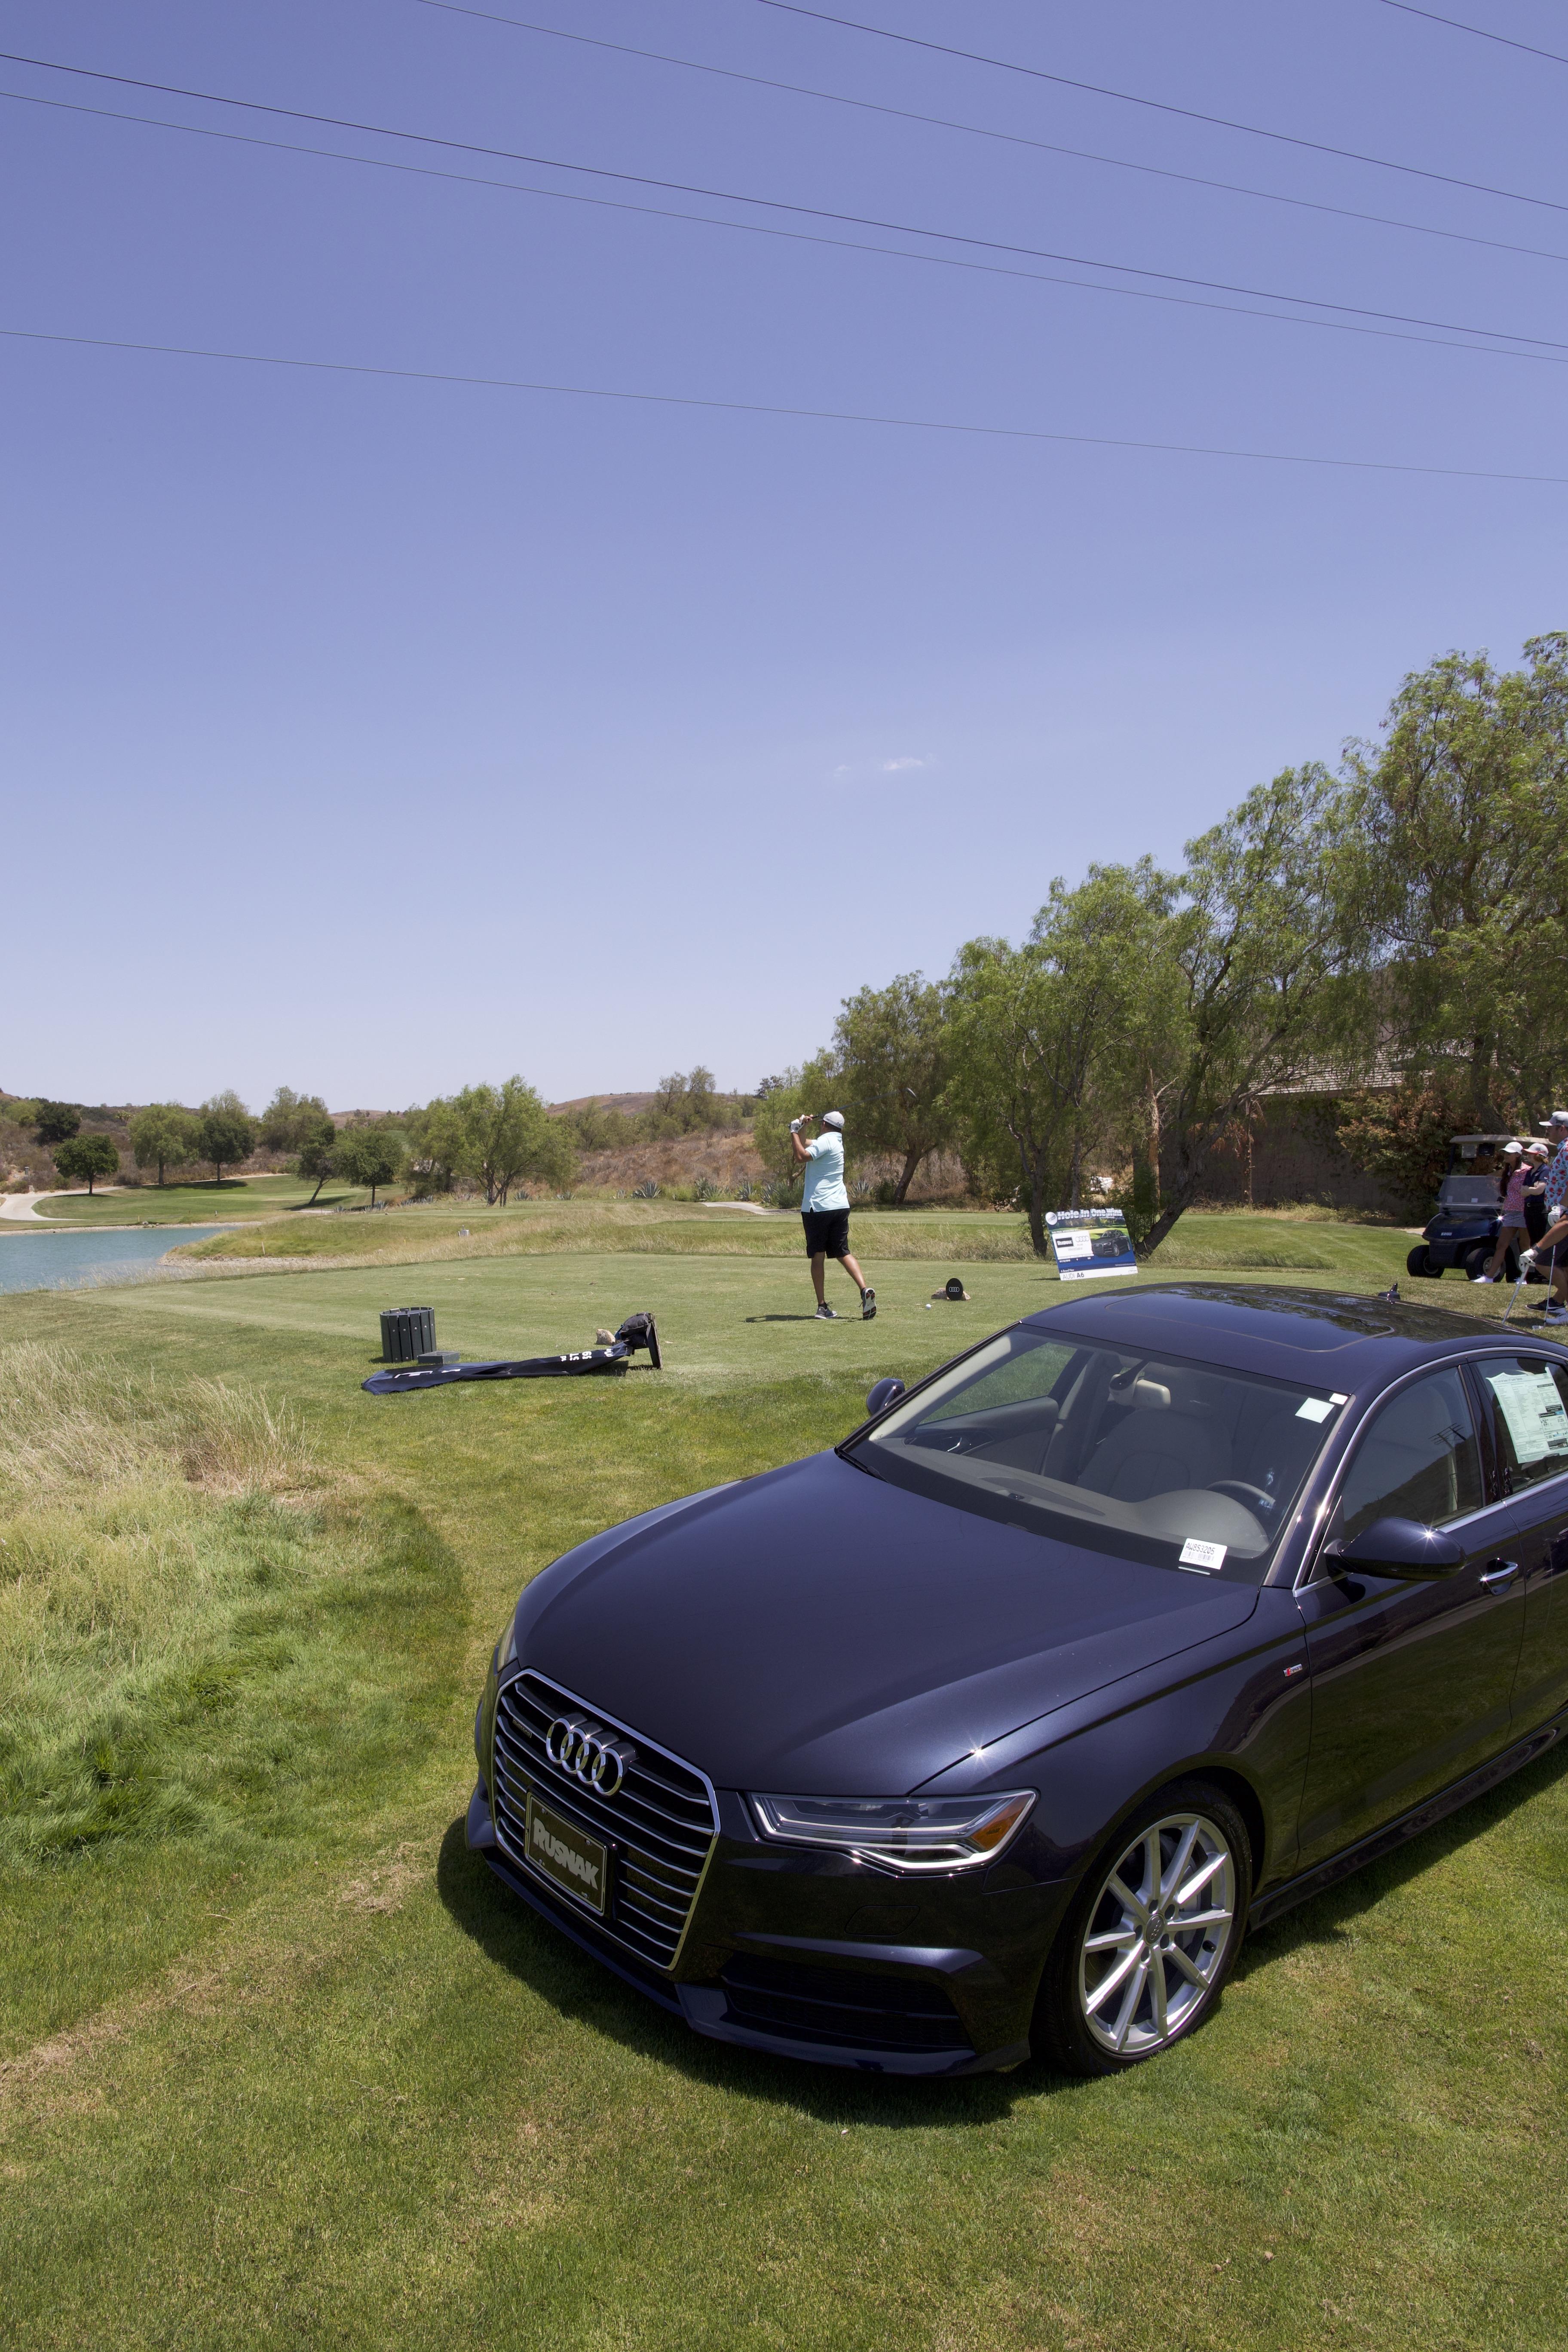 RusnakWestlake Audi Hosts The Audi Quattro Cup Rusnak Events - Rusnak westlake audi